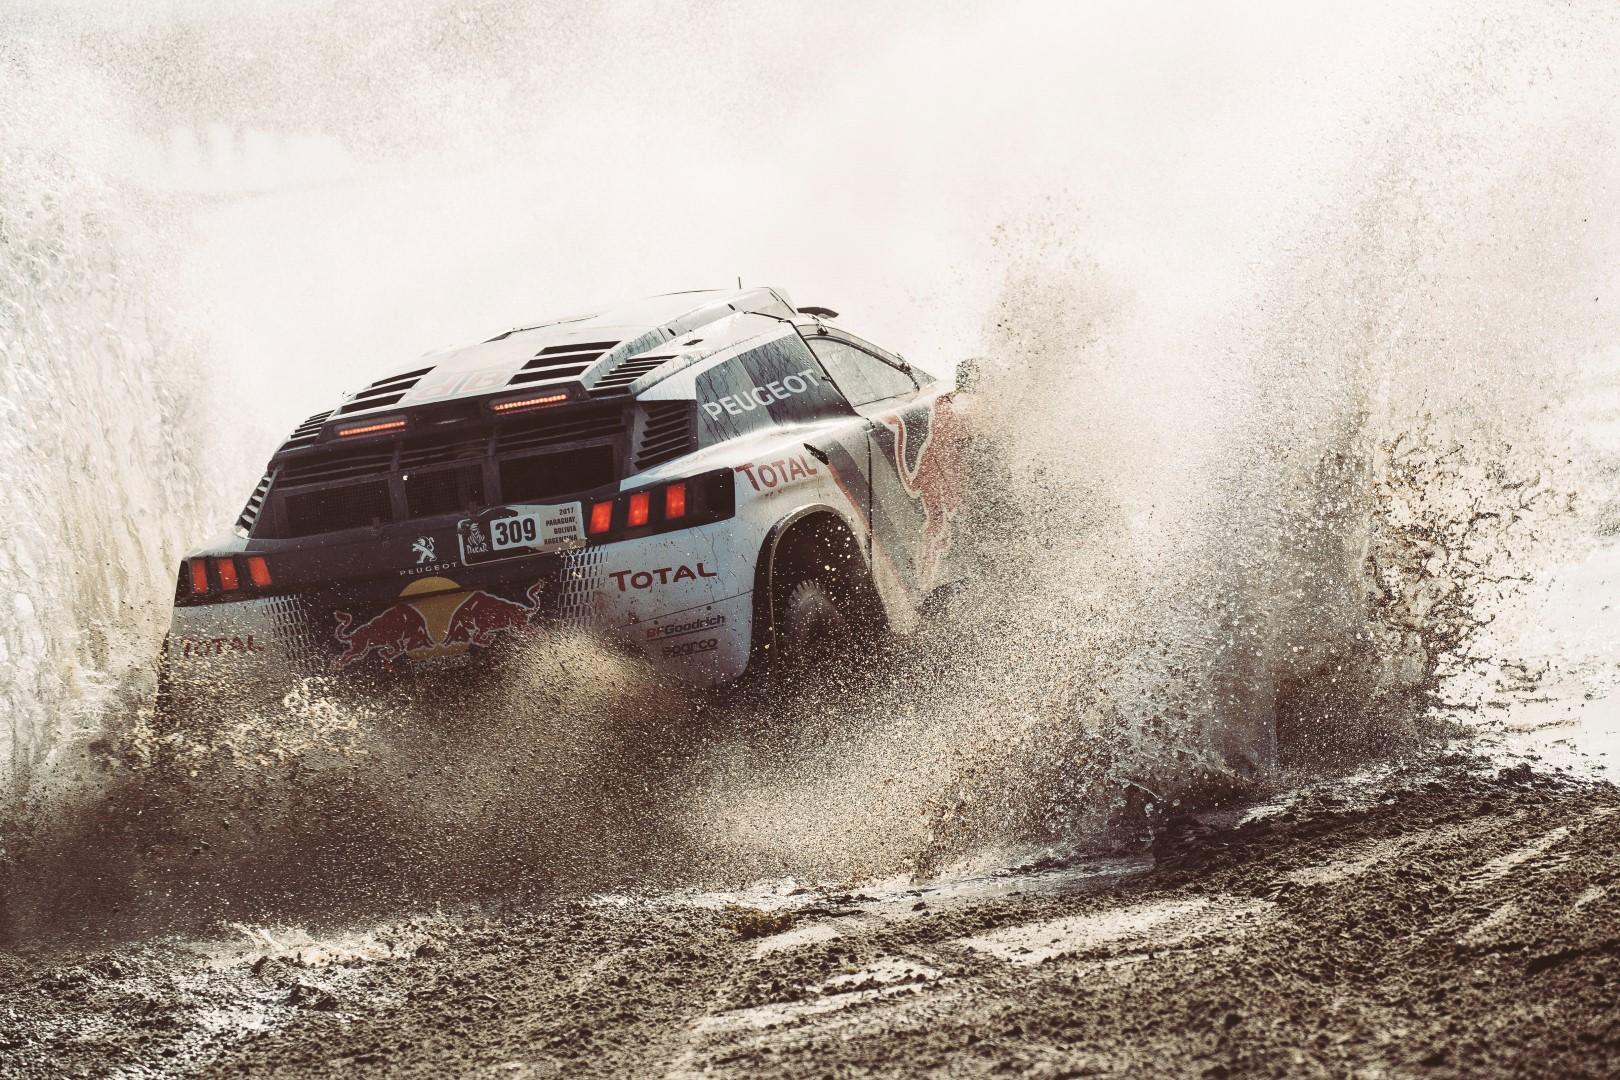 Sebastien Loeb (FRA) of Team Peugeot TOTALraces during stage 8 of Rally Dakar 2017 from Uyuni, Bolivia to Salta, Argentina on January 10, 2017.